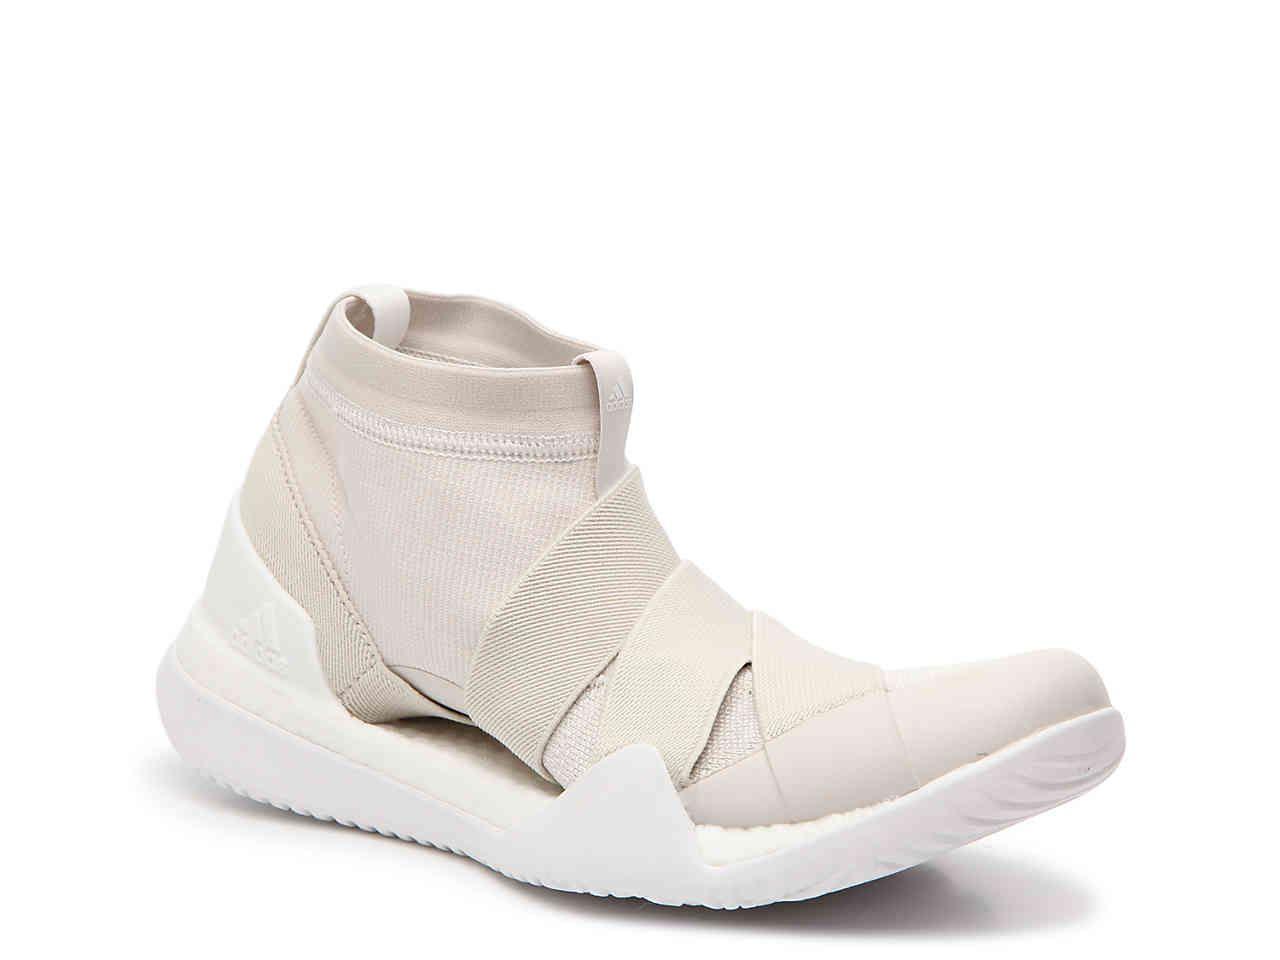 Pureboost X TR 3.0 LL Training Shoe